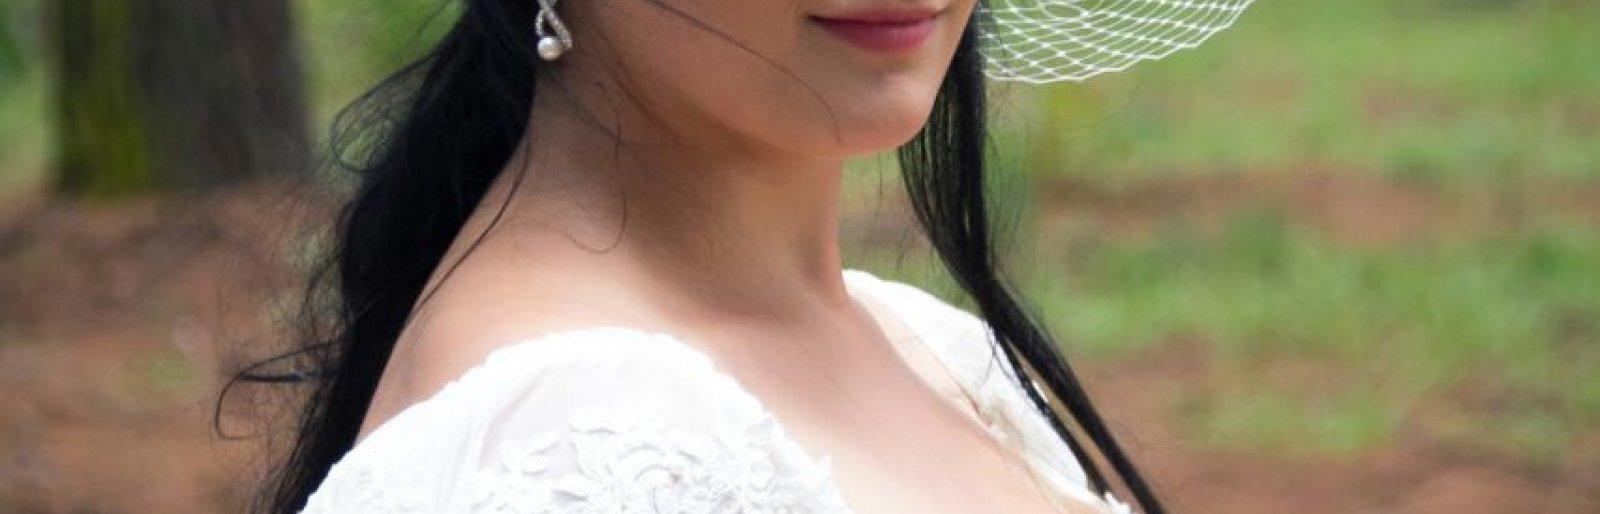 Monique Mong